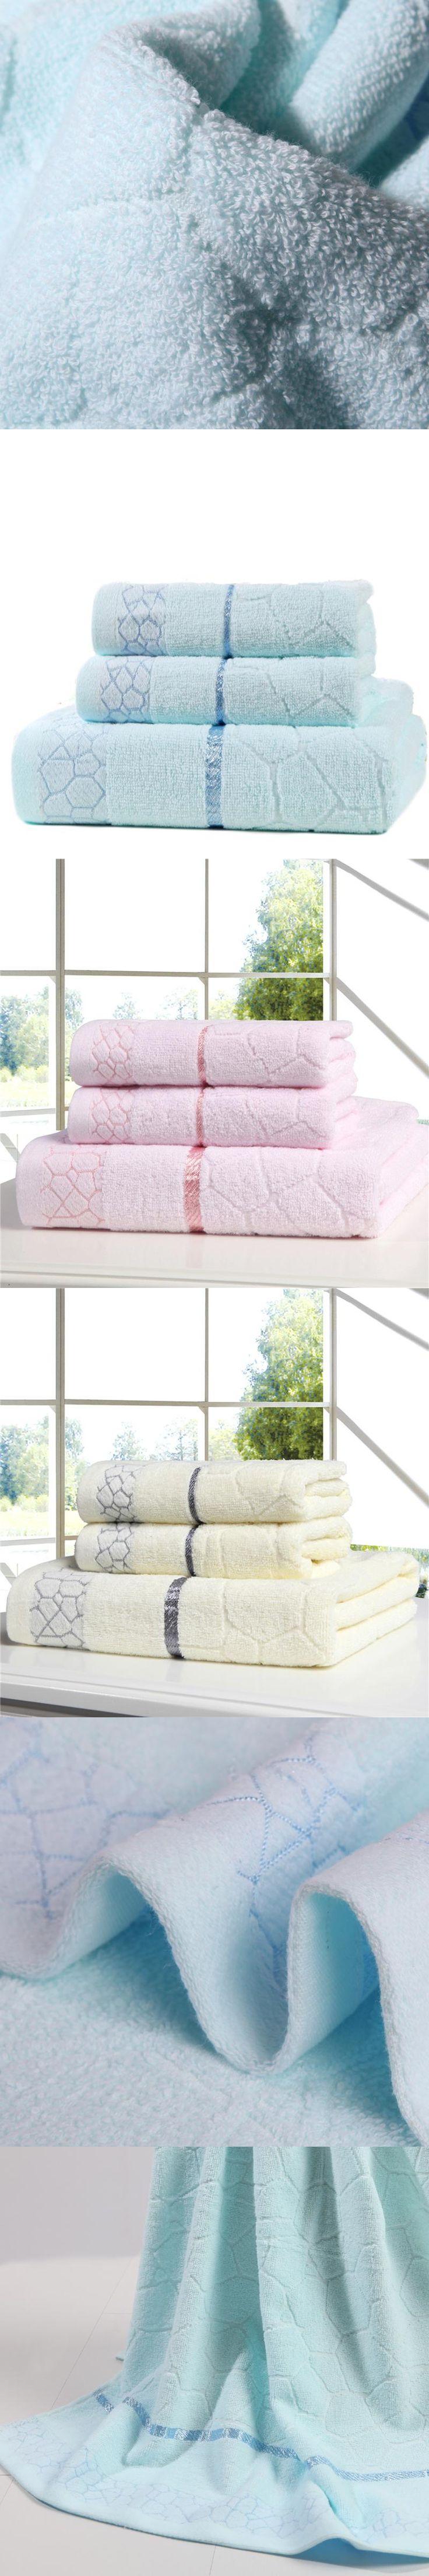 100% Cotton Water cube Towel Set 3pcs Include 1 Bath Towel , 2 Face Towel High Quality Very Soft Towel